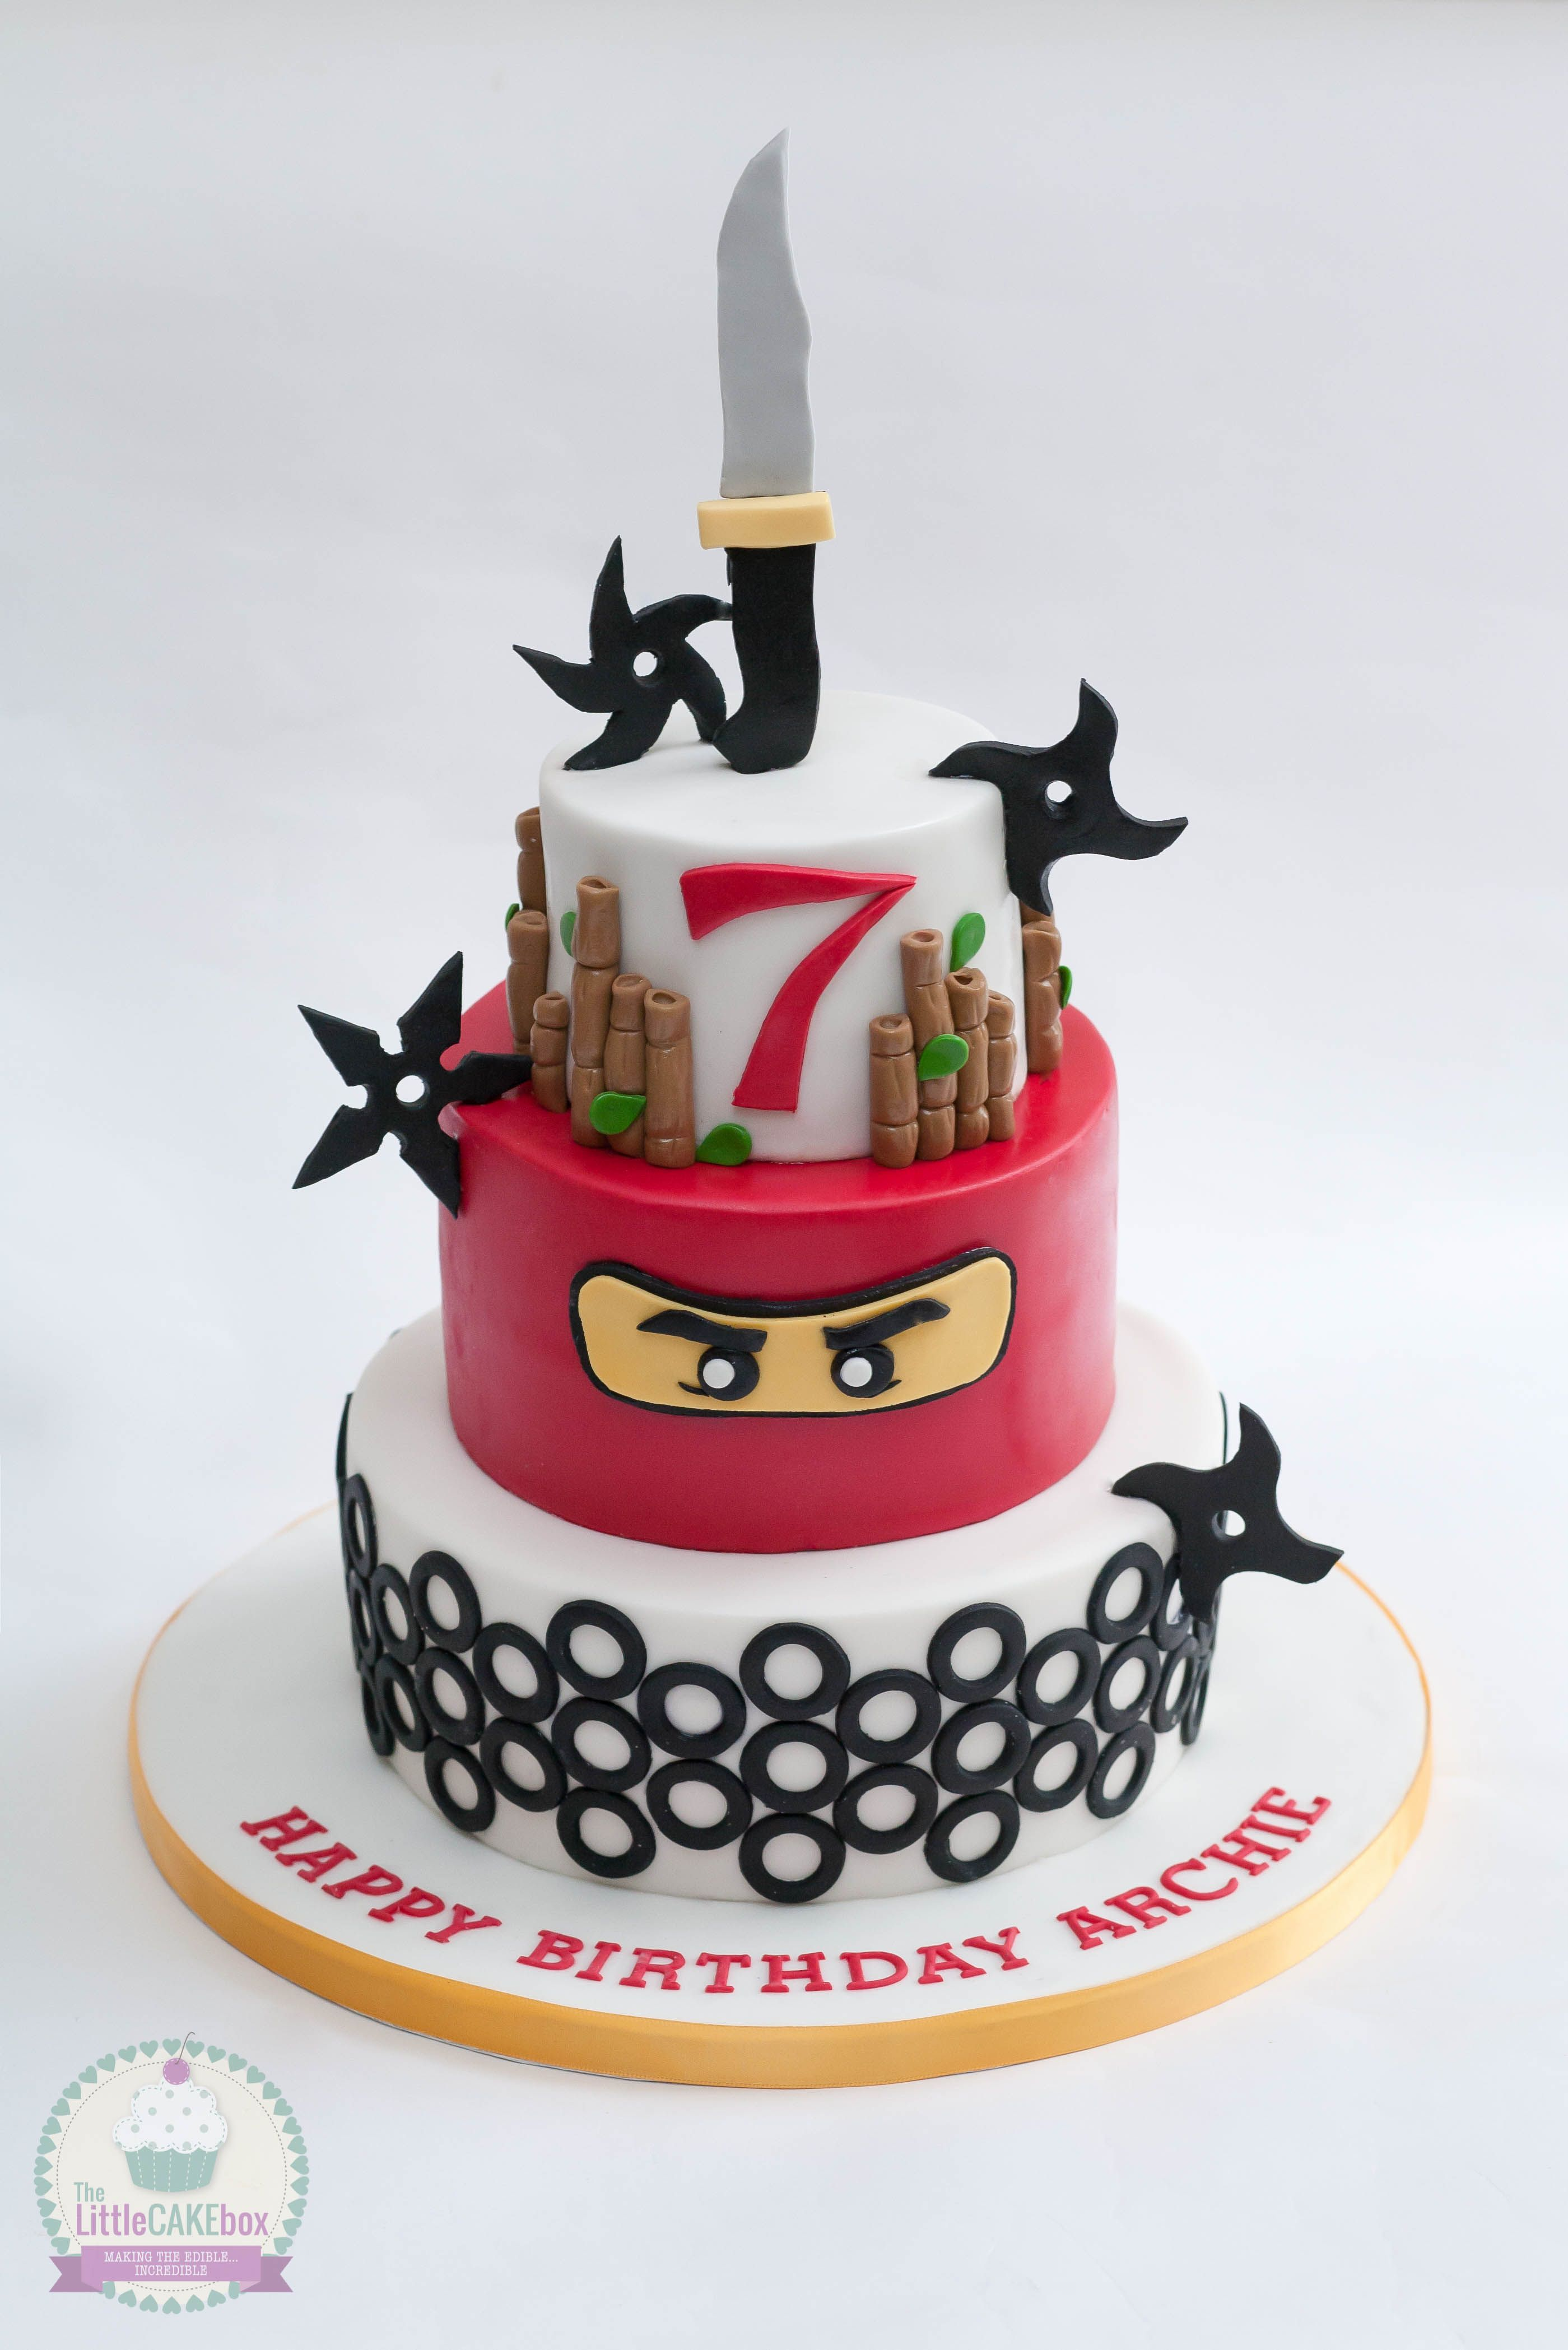 Fantastic Lego Ninjago Cake Lego Ninjago Cake Ninjago Cakes Birthday Funny Birthday Cards Online Alyptdamsfinfo